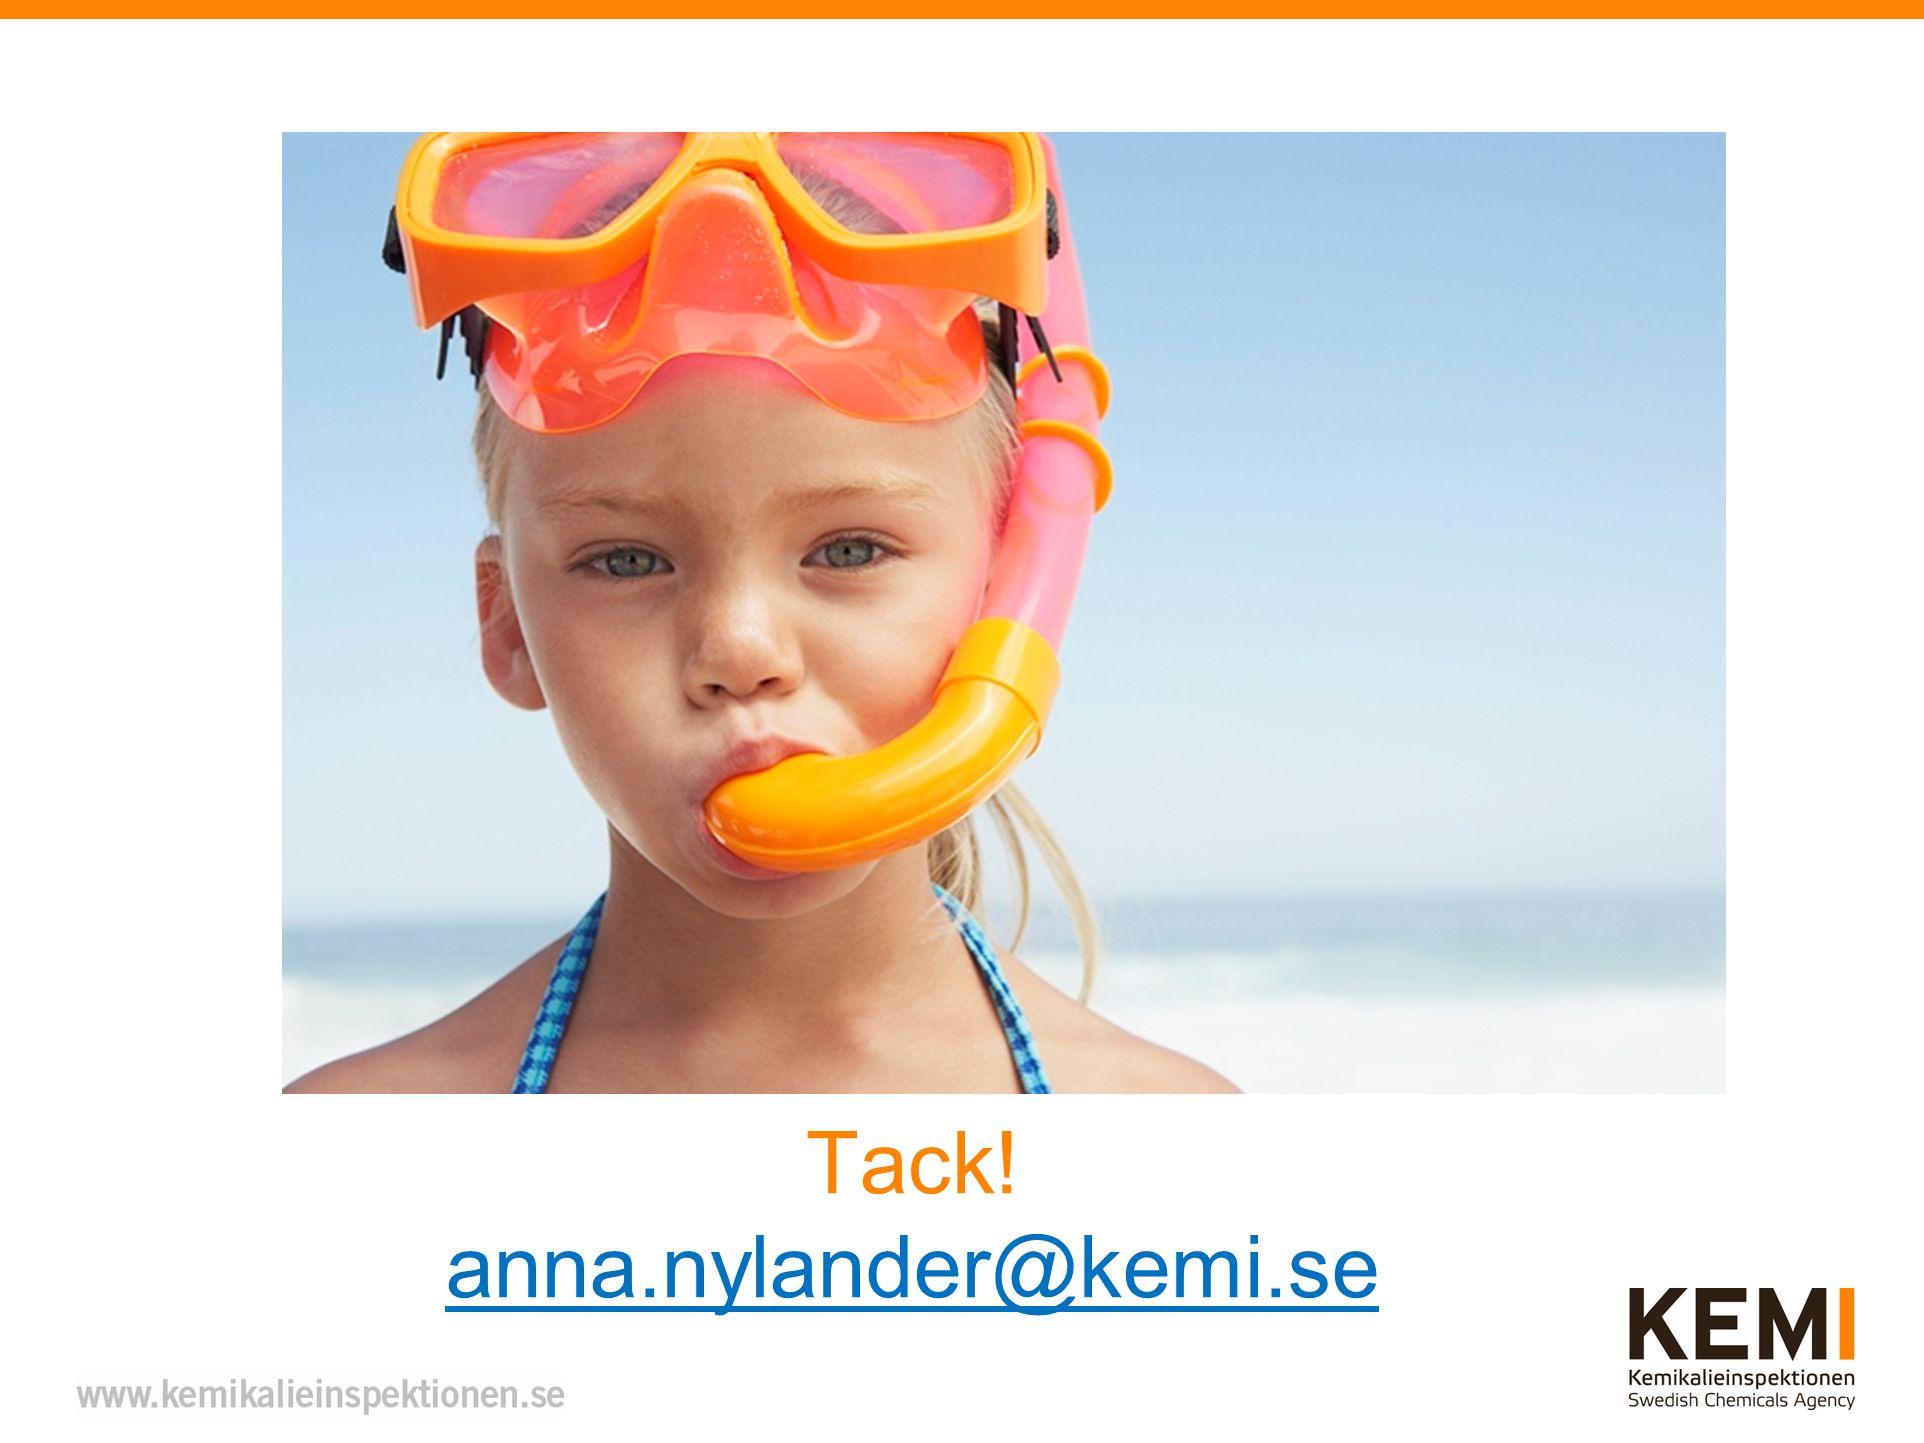 Tack! anna.nylander@kemi.se anna.nylander@kemi.se